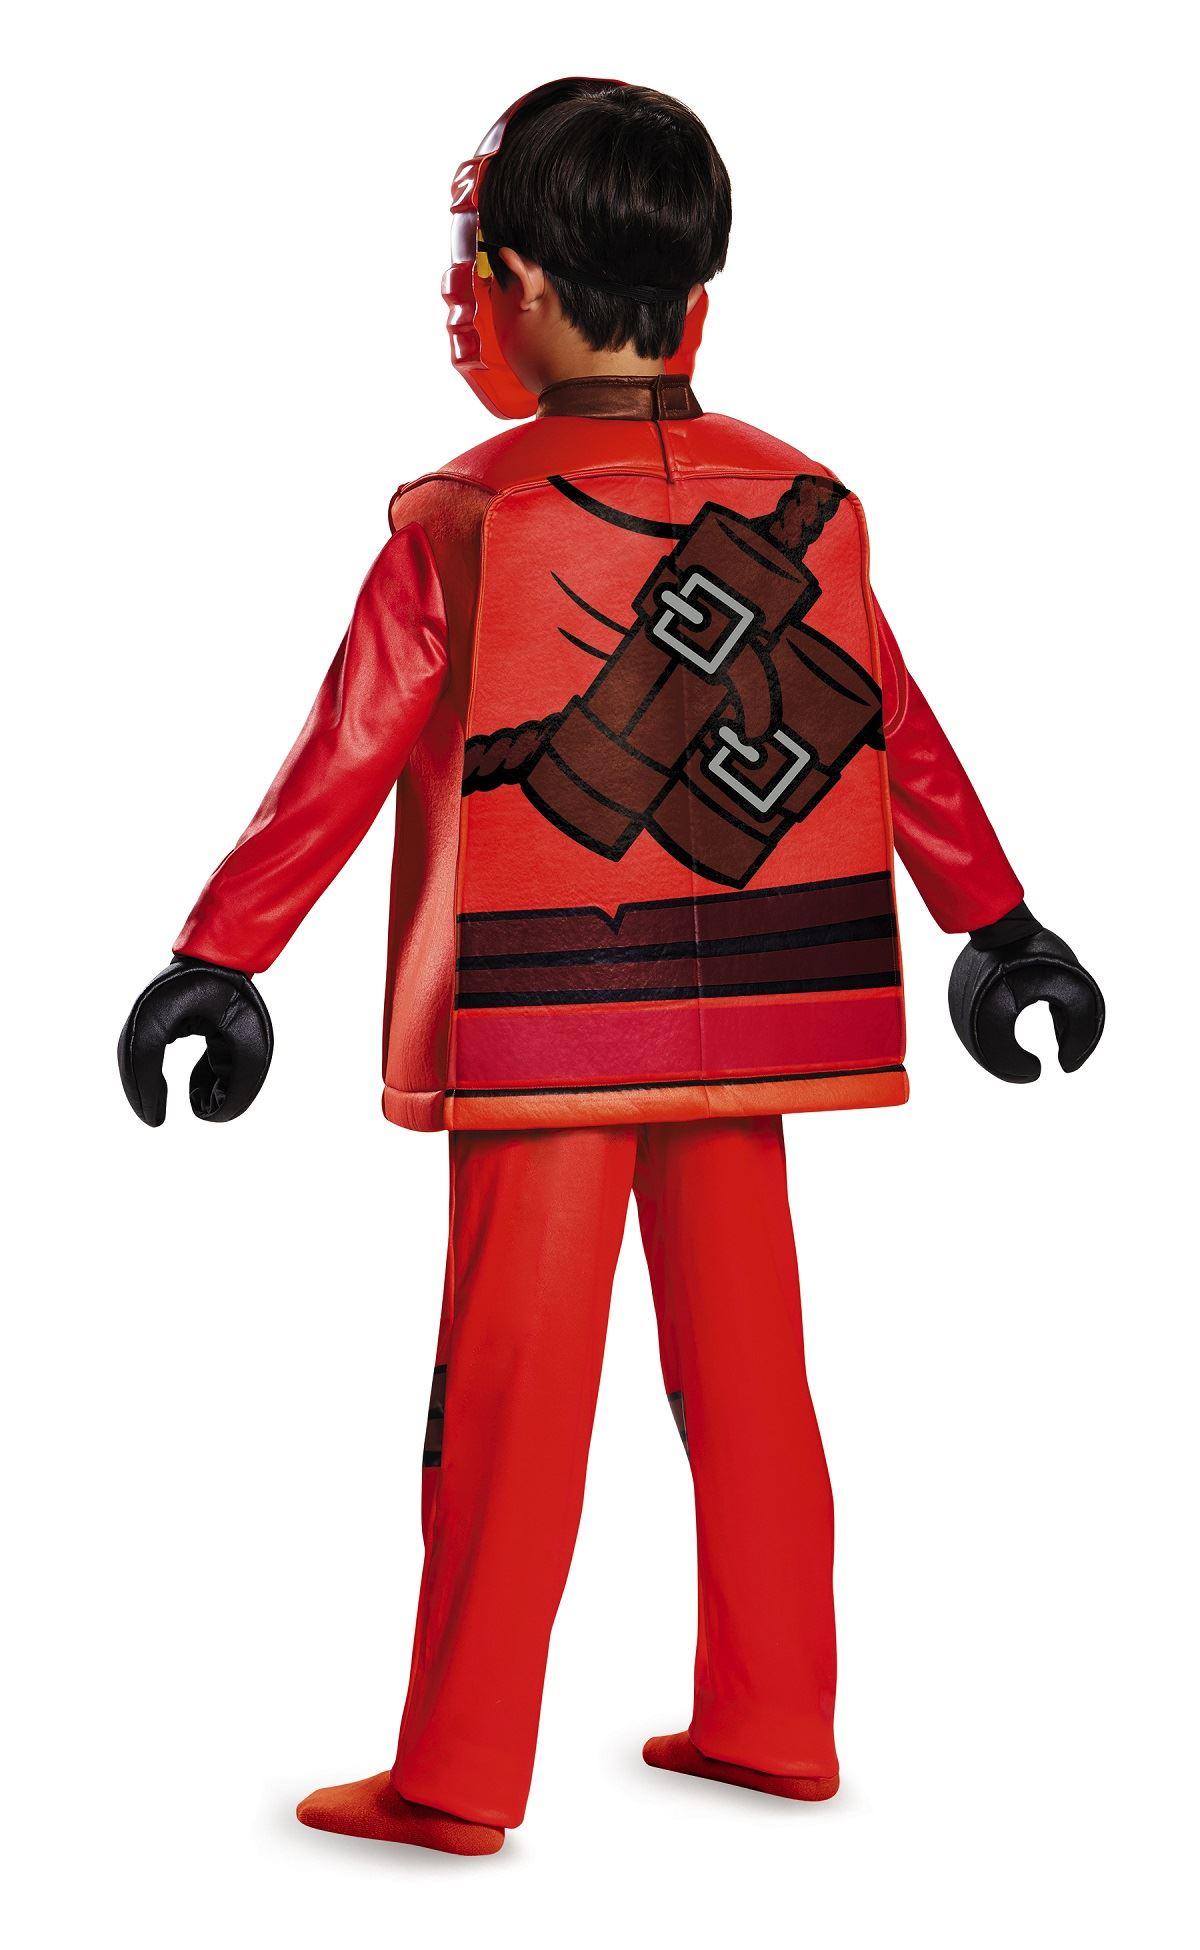 ... Kids Lego Ninjago Kai Boys Costume  sc 1 st  The Costume Land & Kids Lego Ninjago Kai Boys Costume | $47.99 | The Costume Land